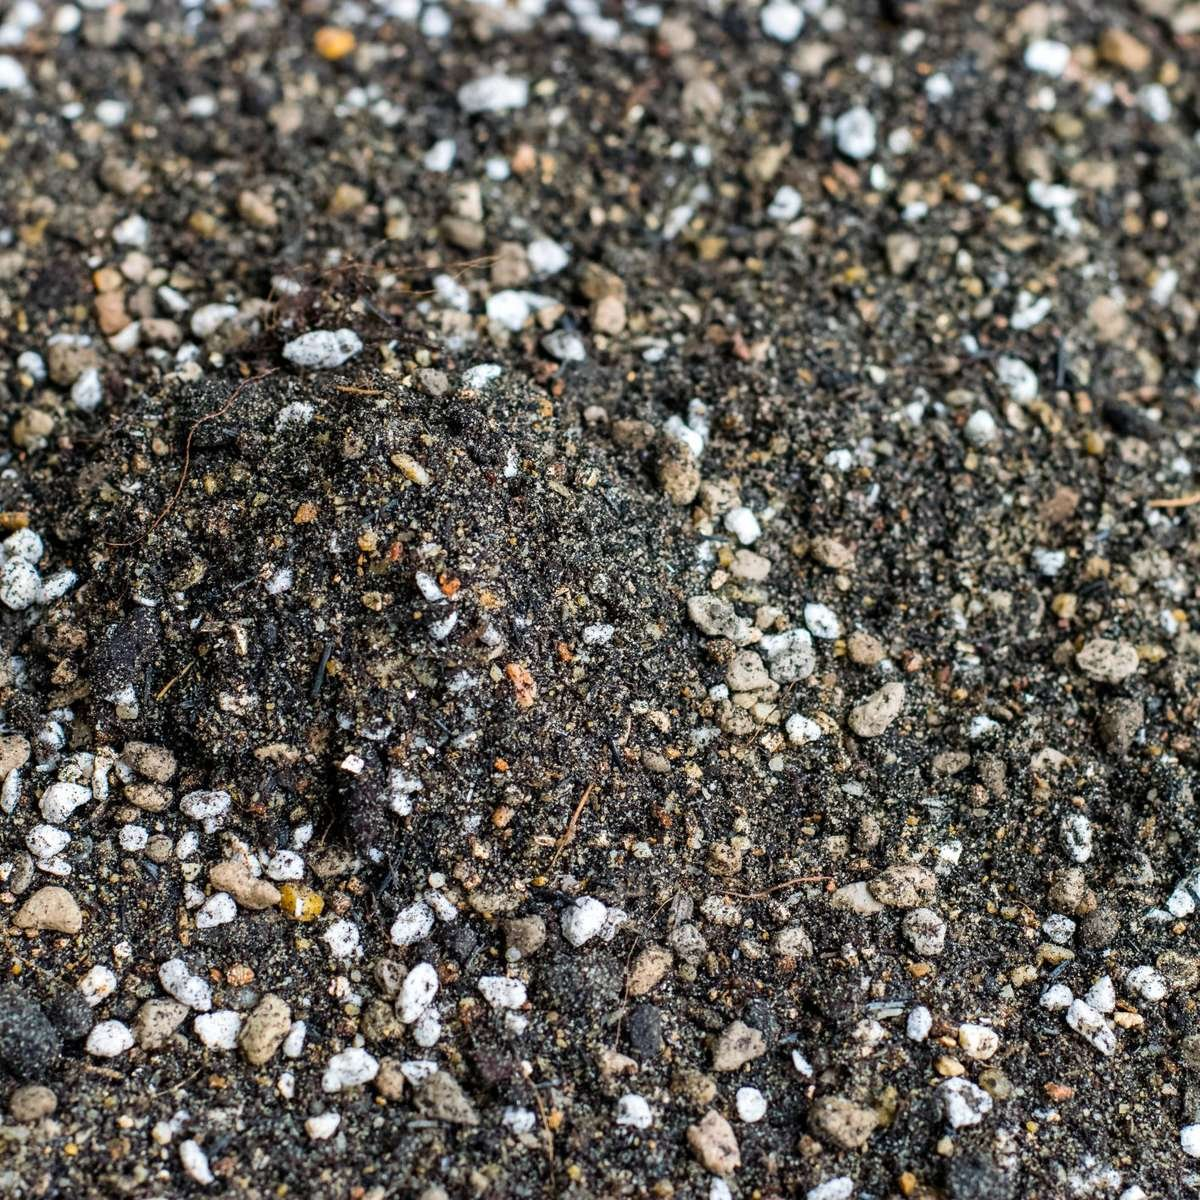 Lava Rock in Soil